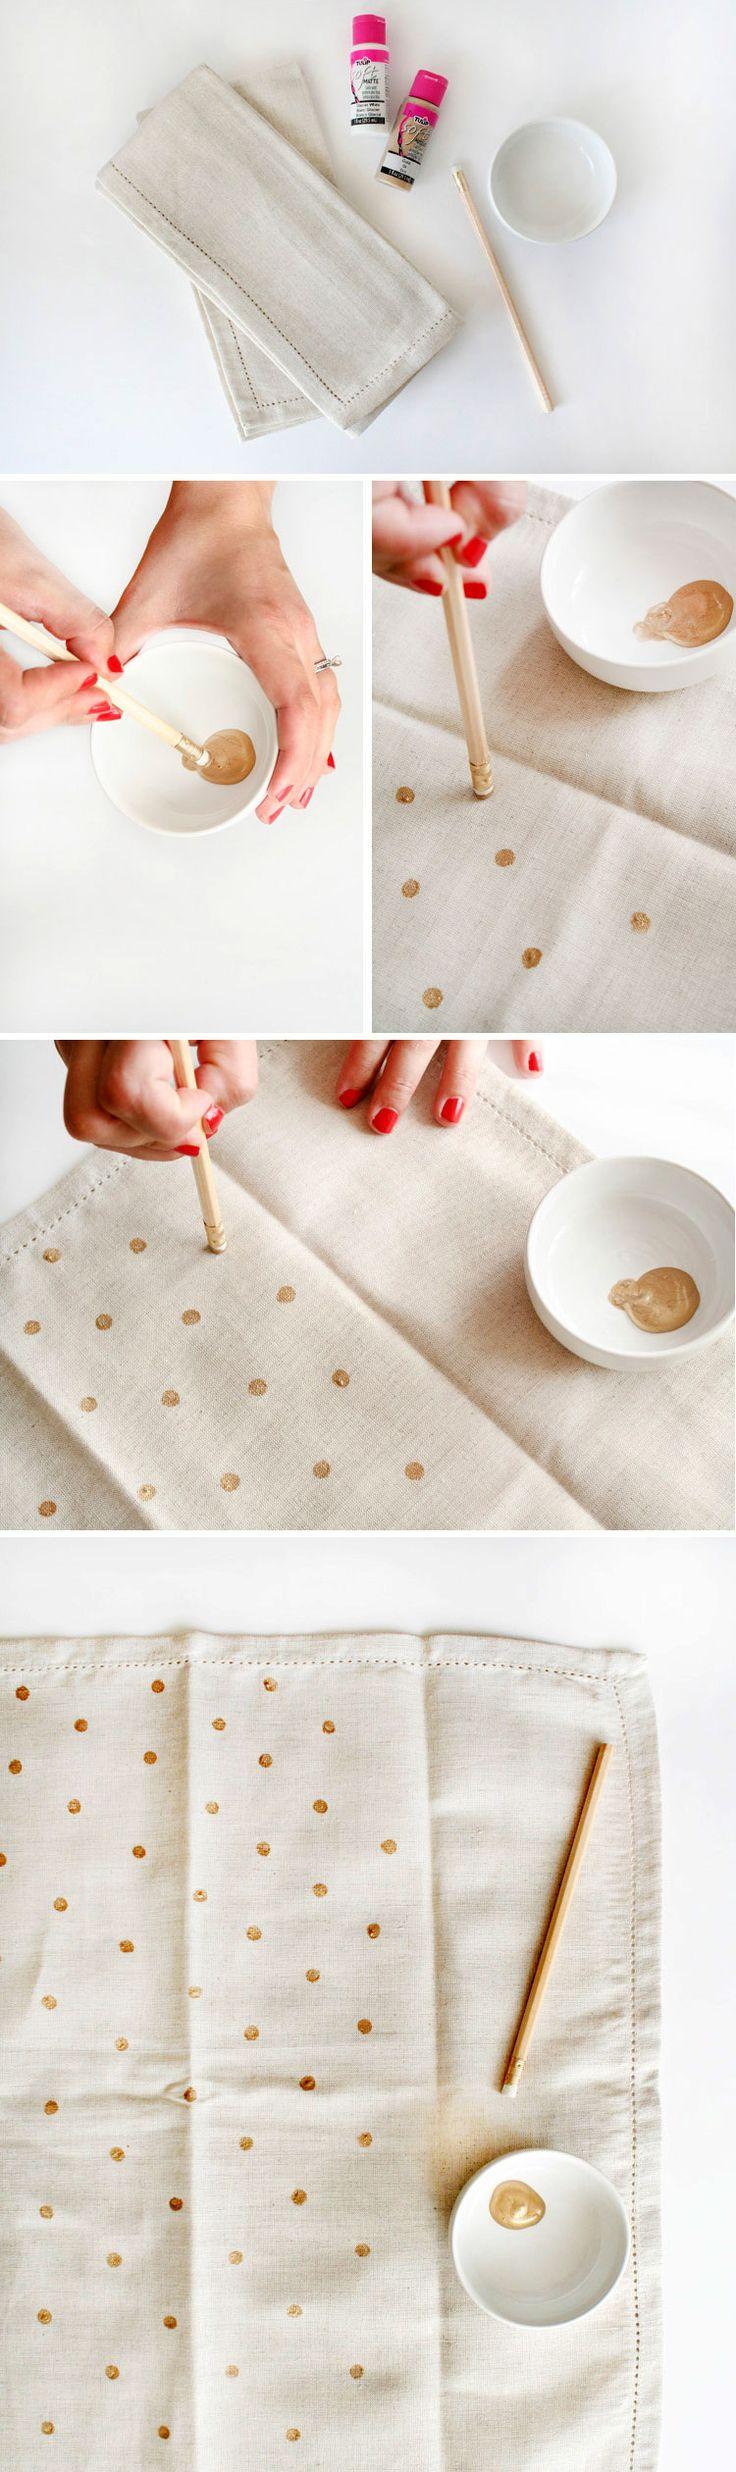 DIY Polka Dot Napkins   Freutcake